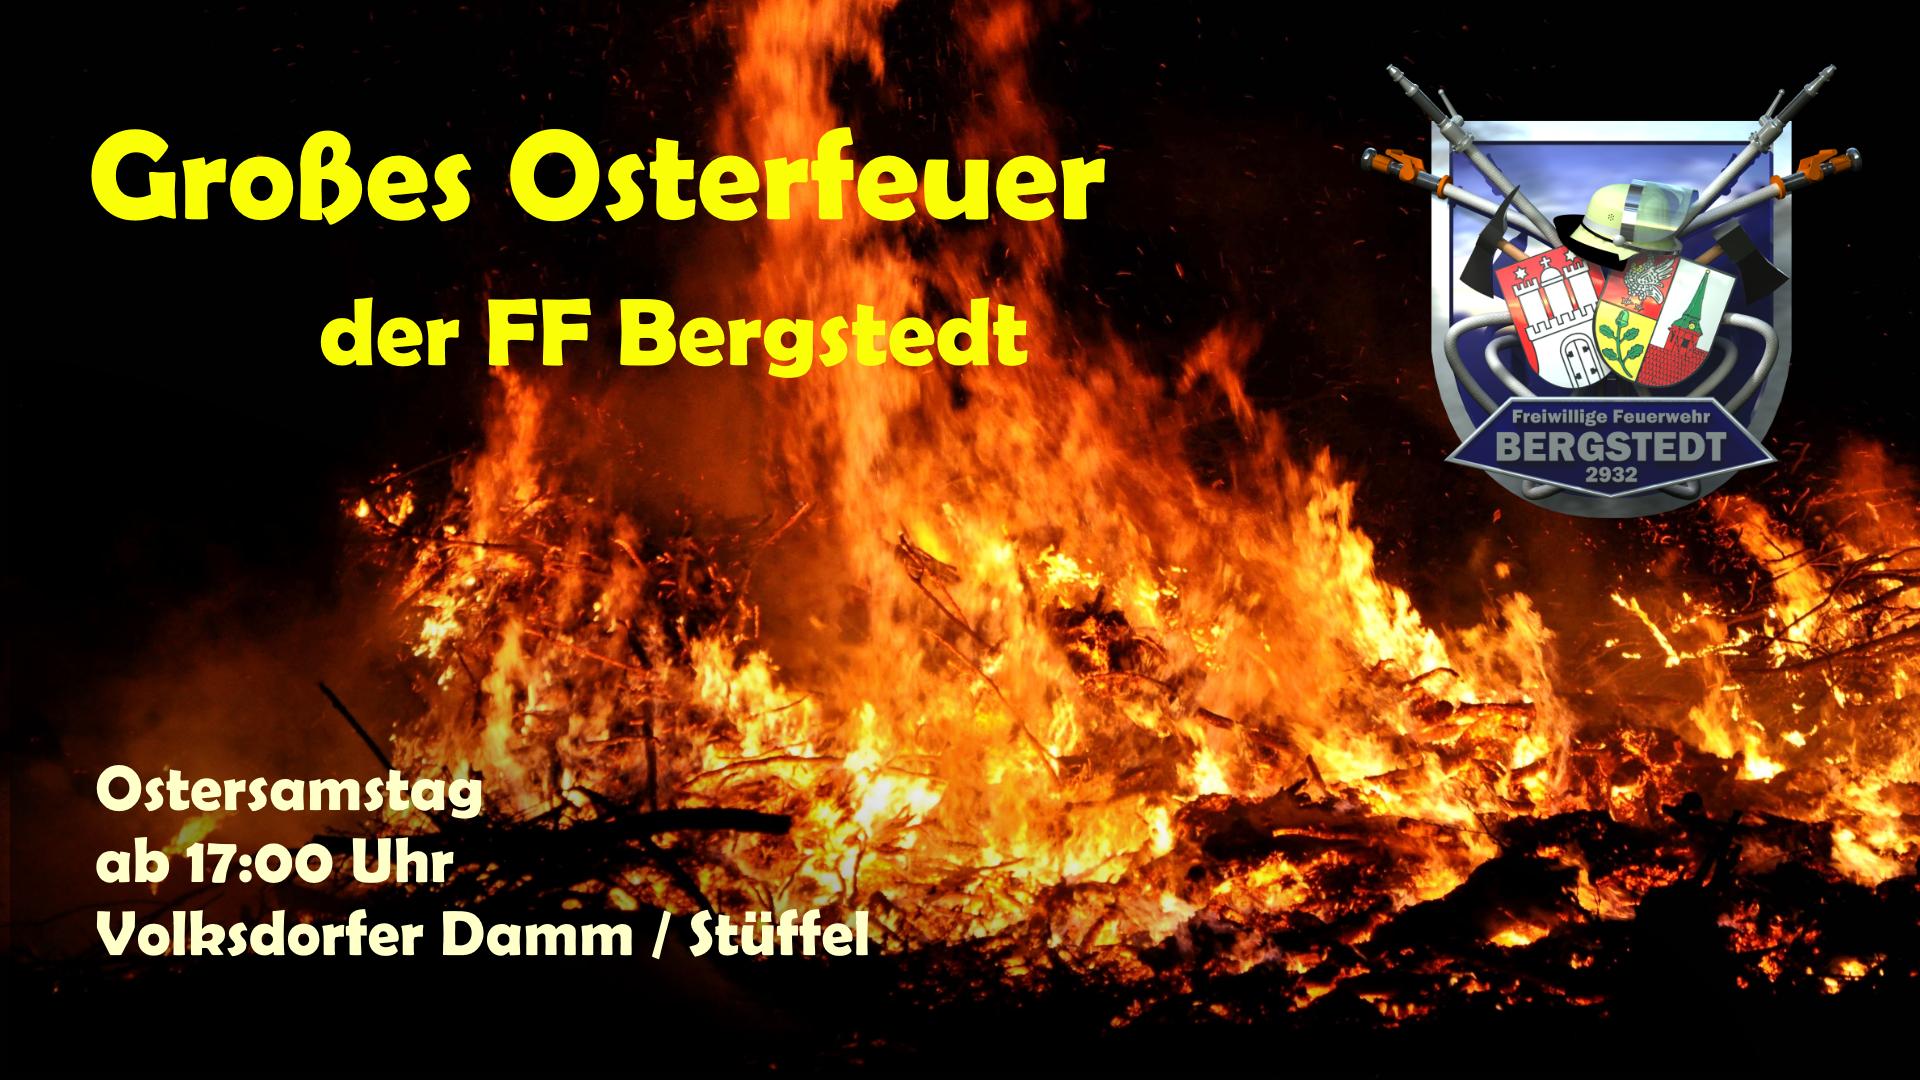 Osterfeuer volksdorf